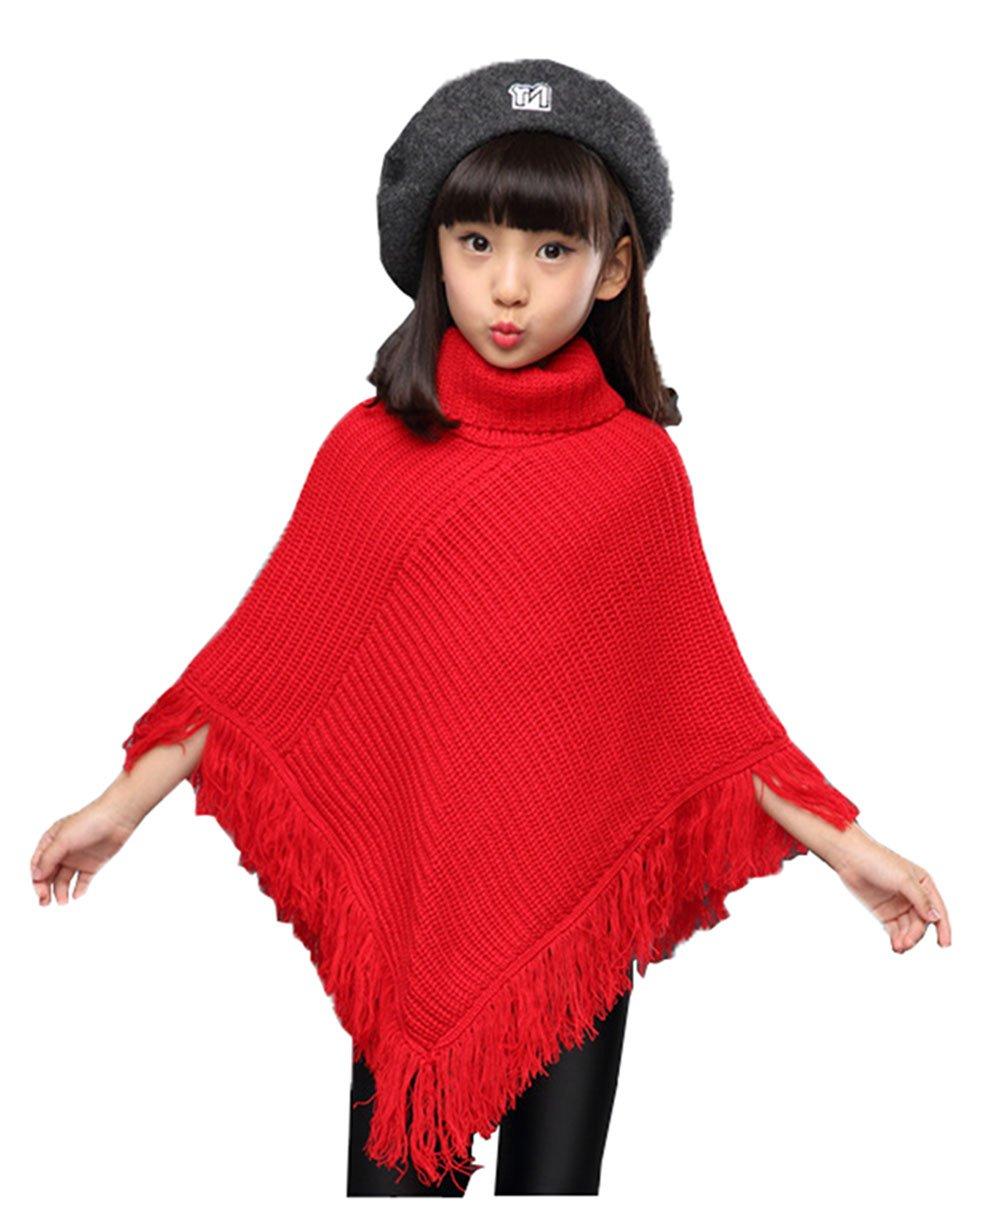 Fankeshi Girls High Neck Knitted Poncho Tassel Draped Cloak Coat Cape Sweater (Red, 9-10 Years)